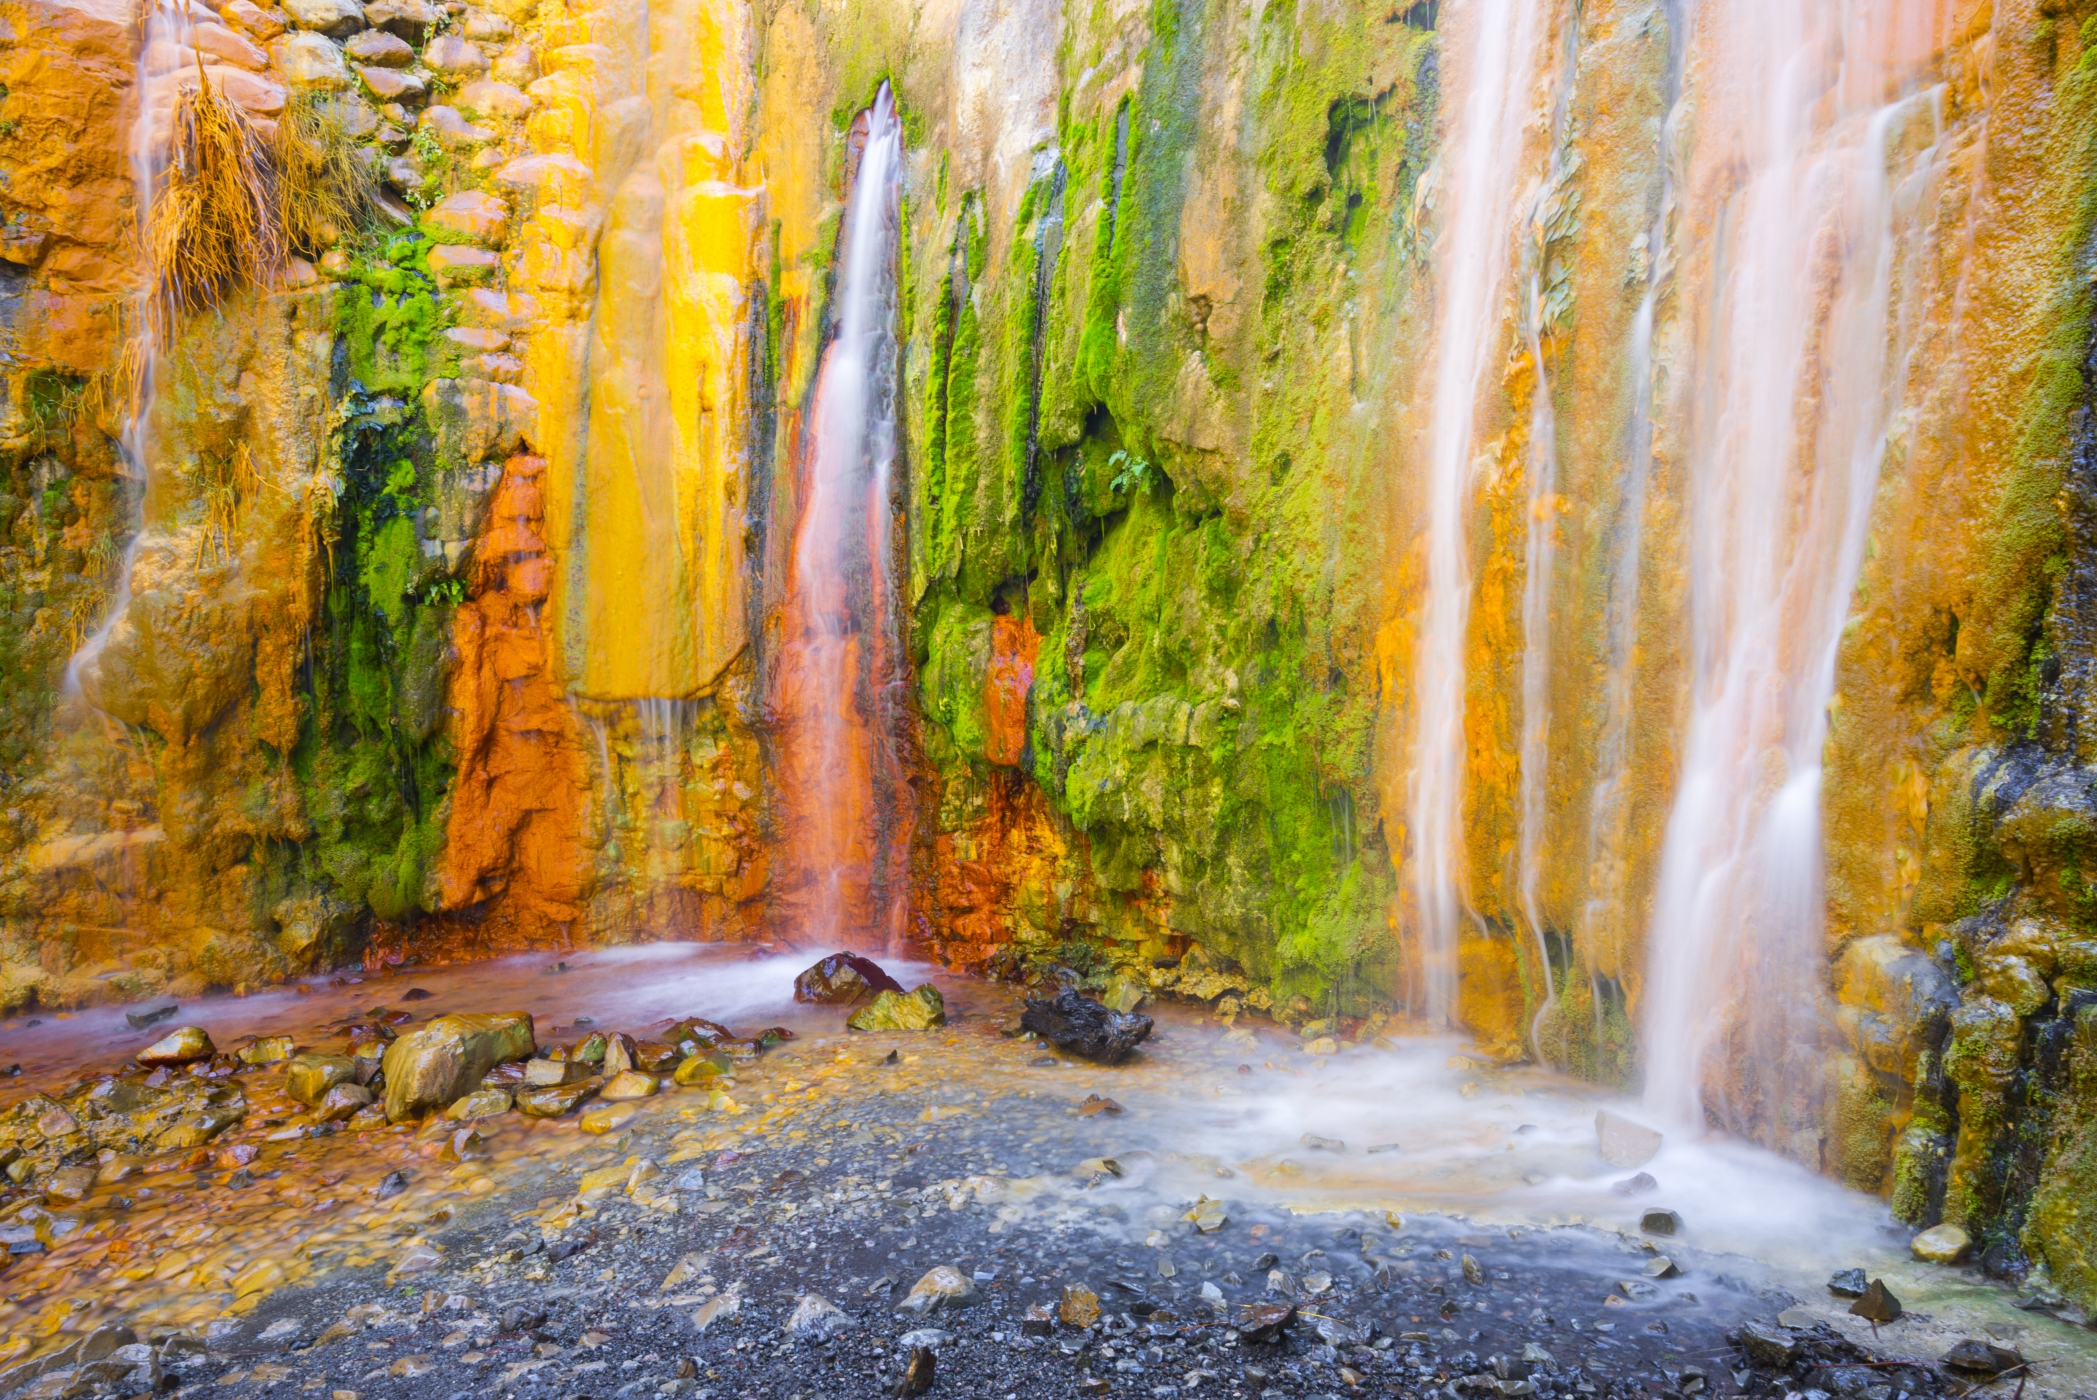 Una cascada que parece un arcoíris. Foto: shutterstock.